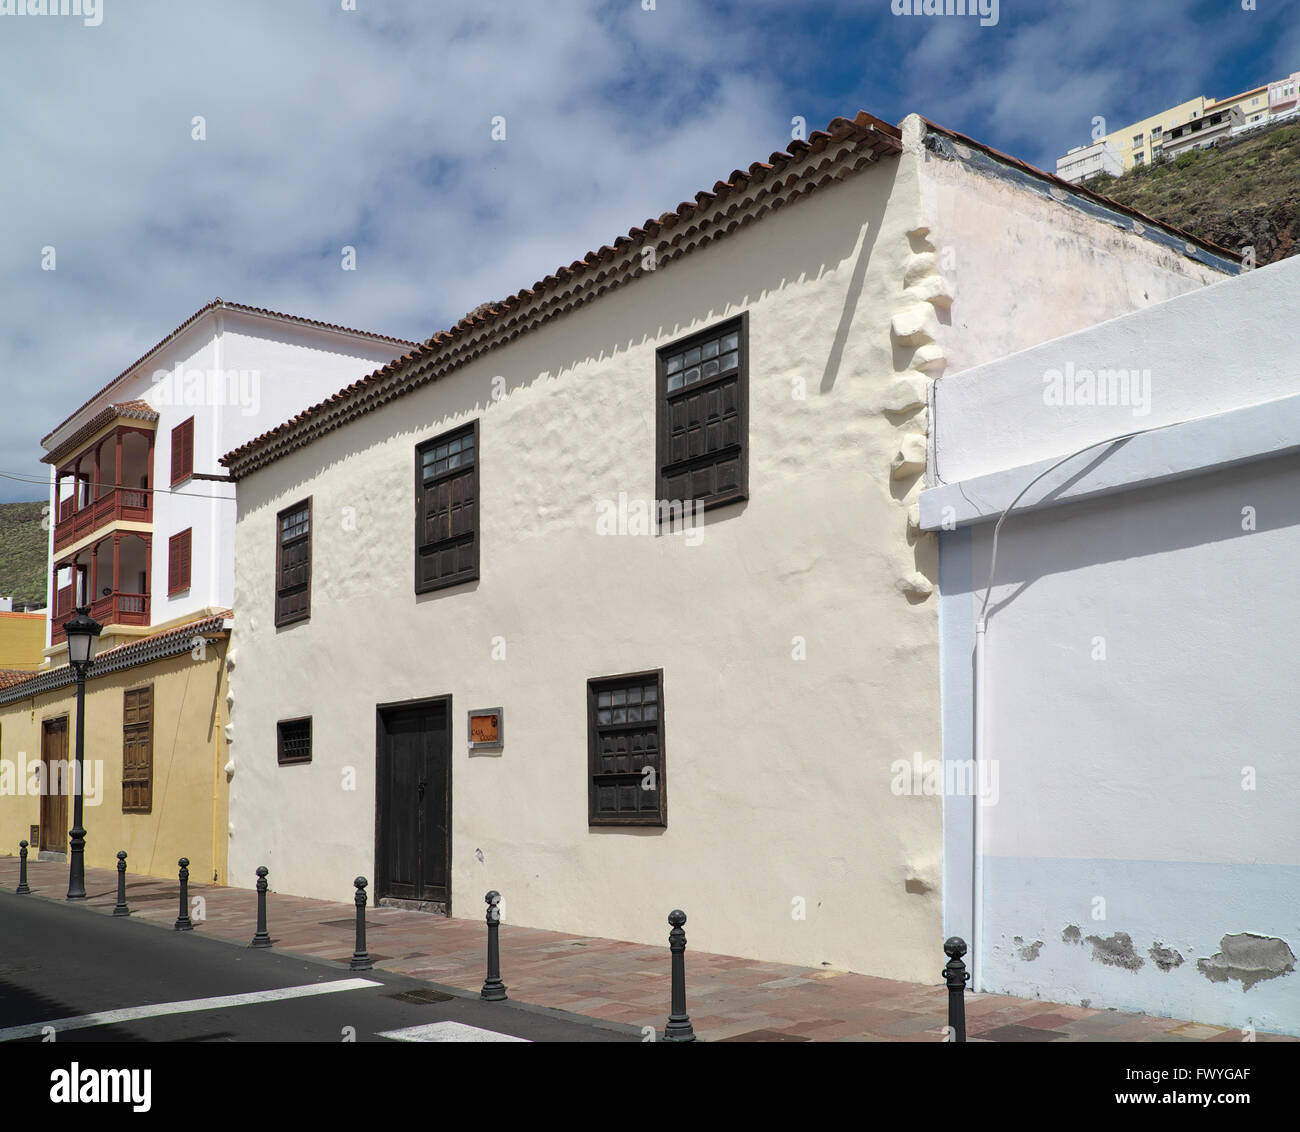 Casa de col n columbus house san sebastian de la gomera - Casa san sebastian ...